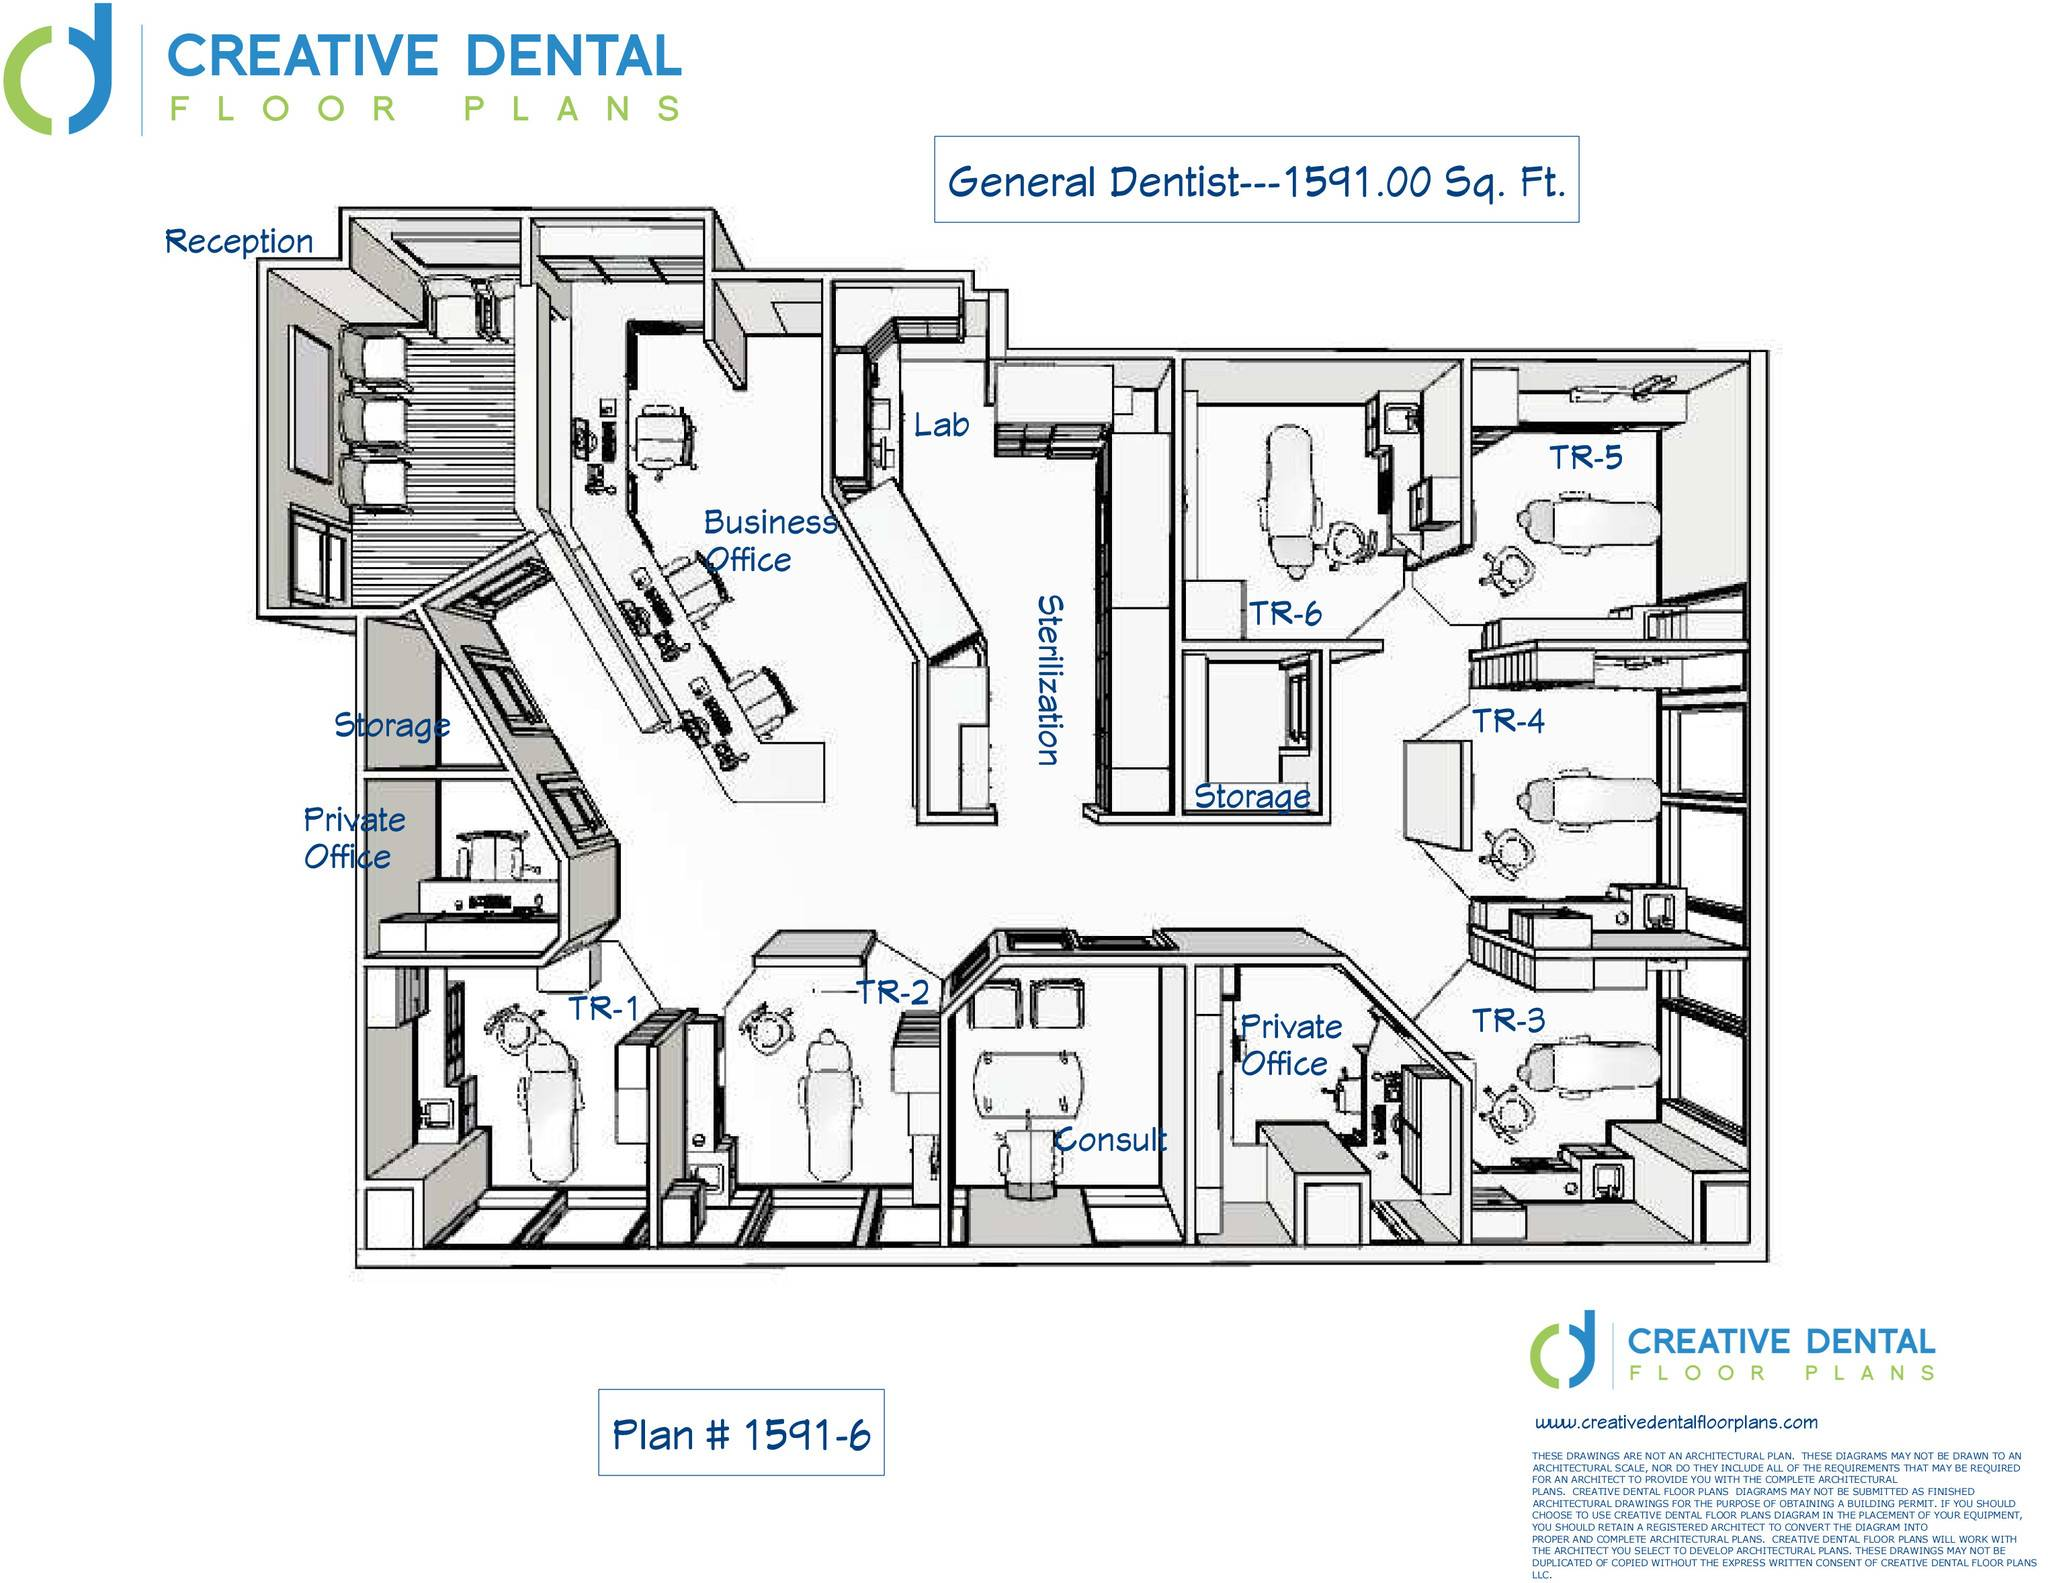 Creative Dental Floor Plans Strip Mall House Plans 135052